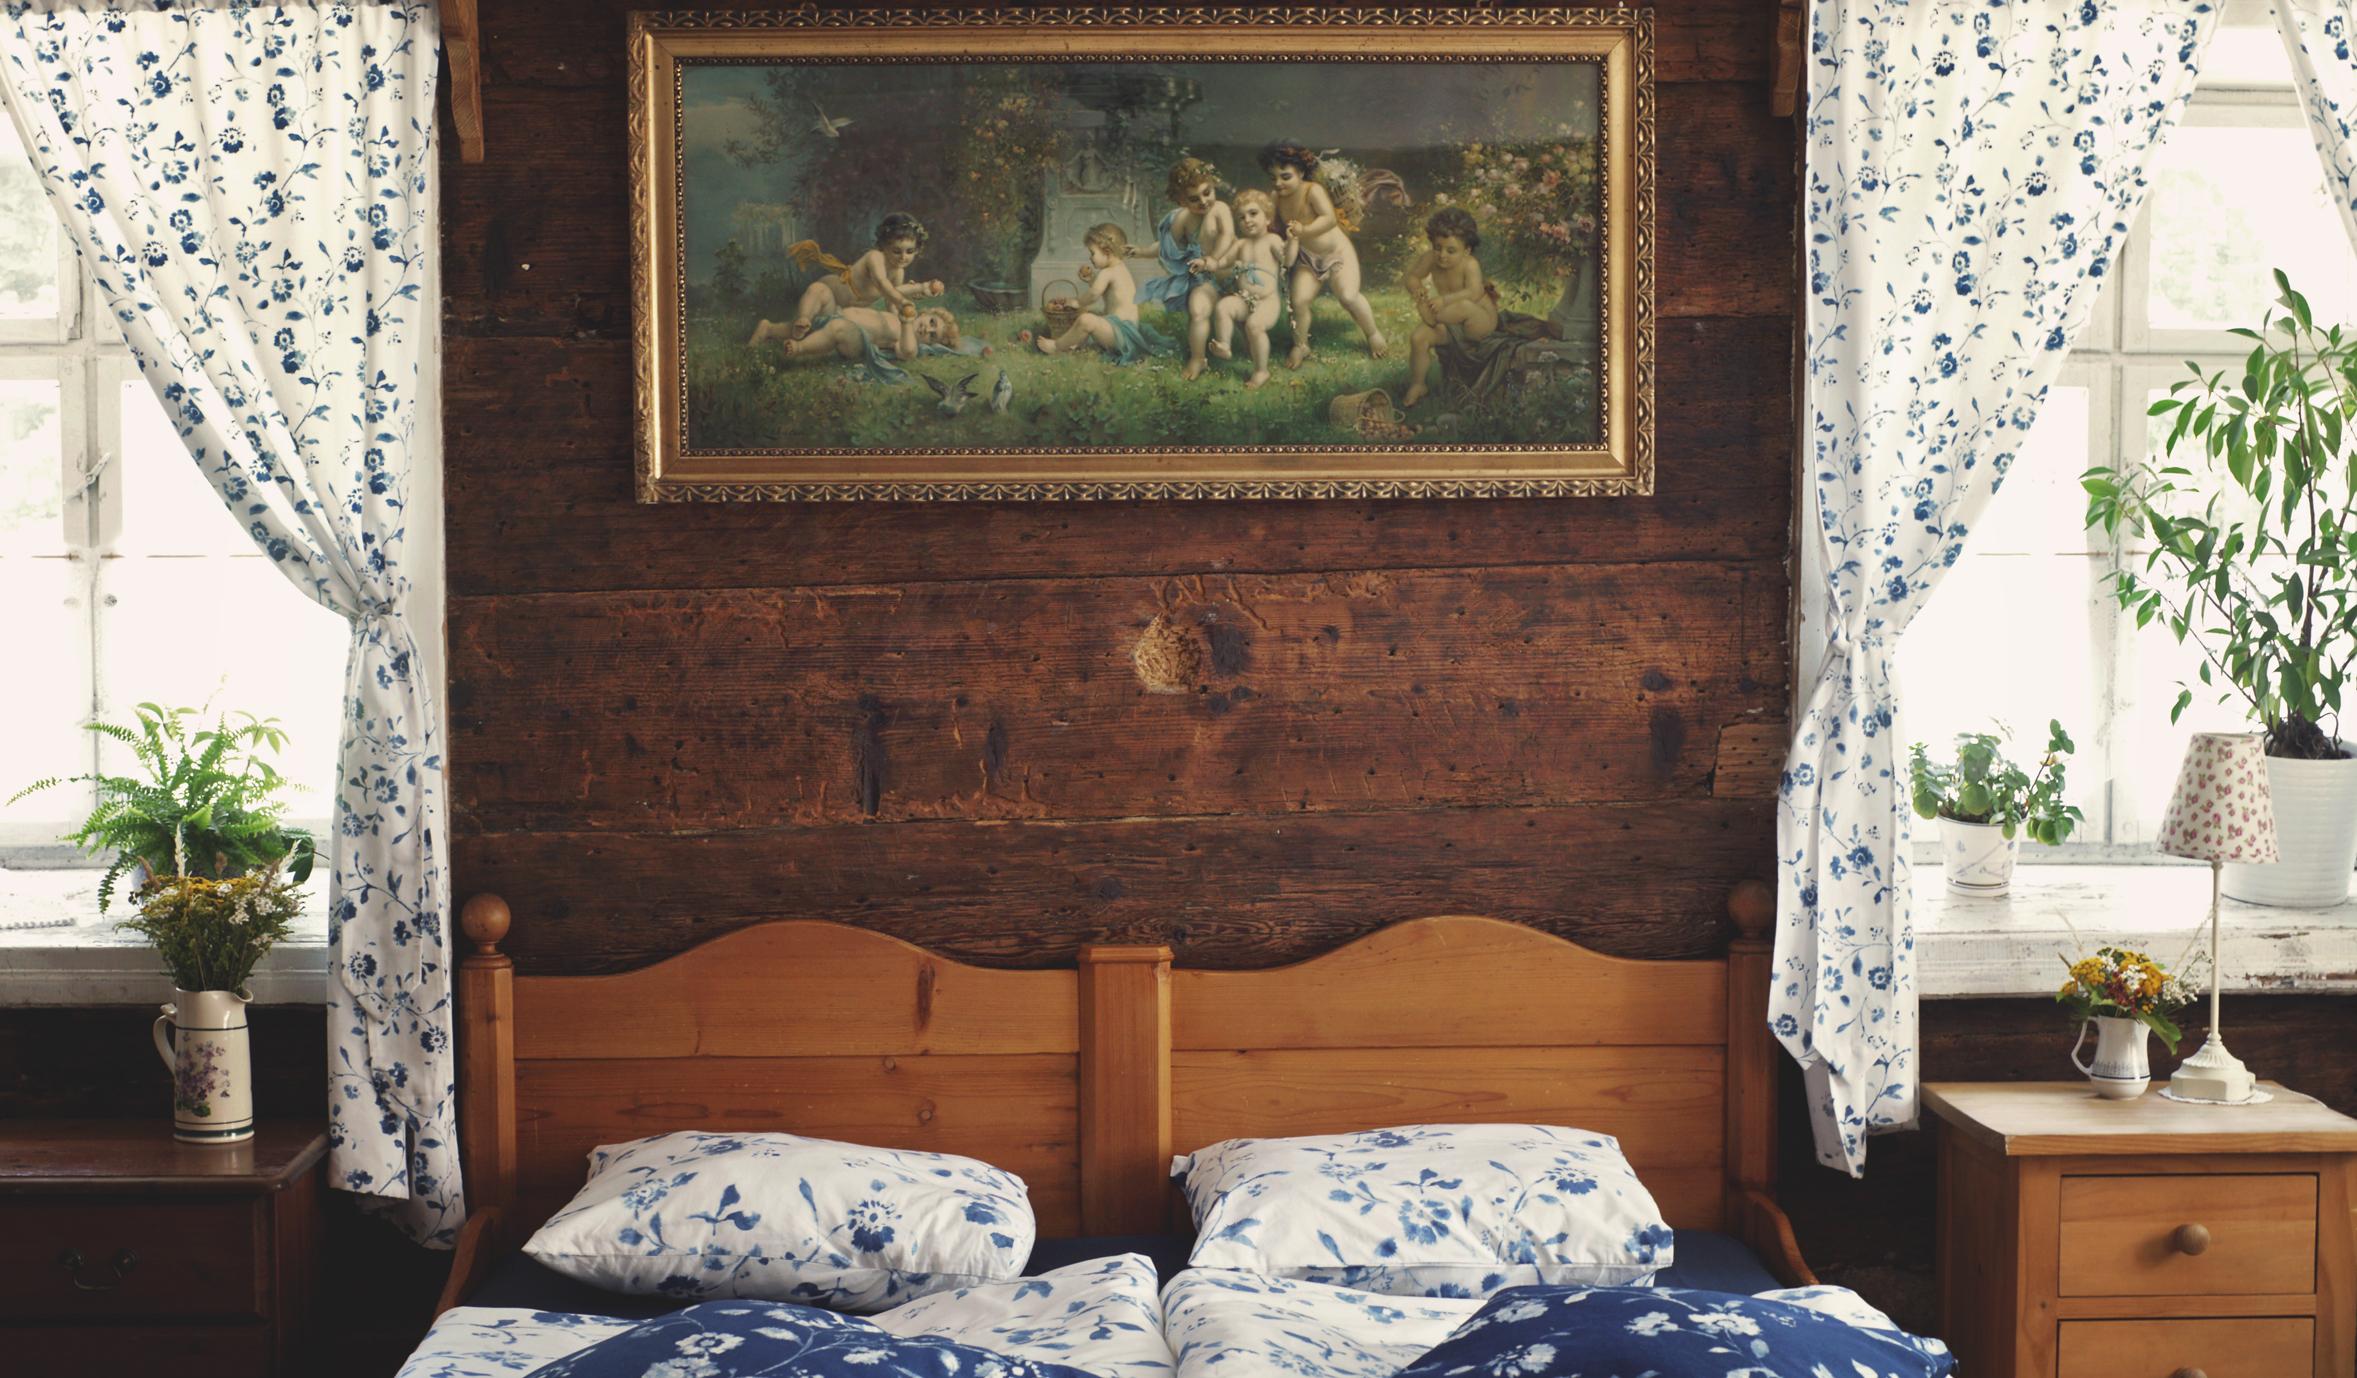 Osada Ptaśnik - Where will I sleep?